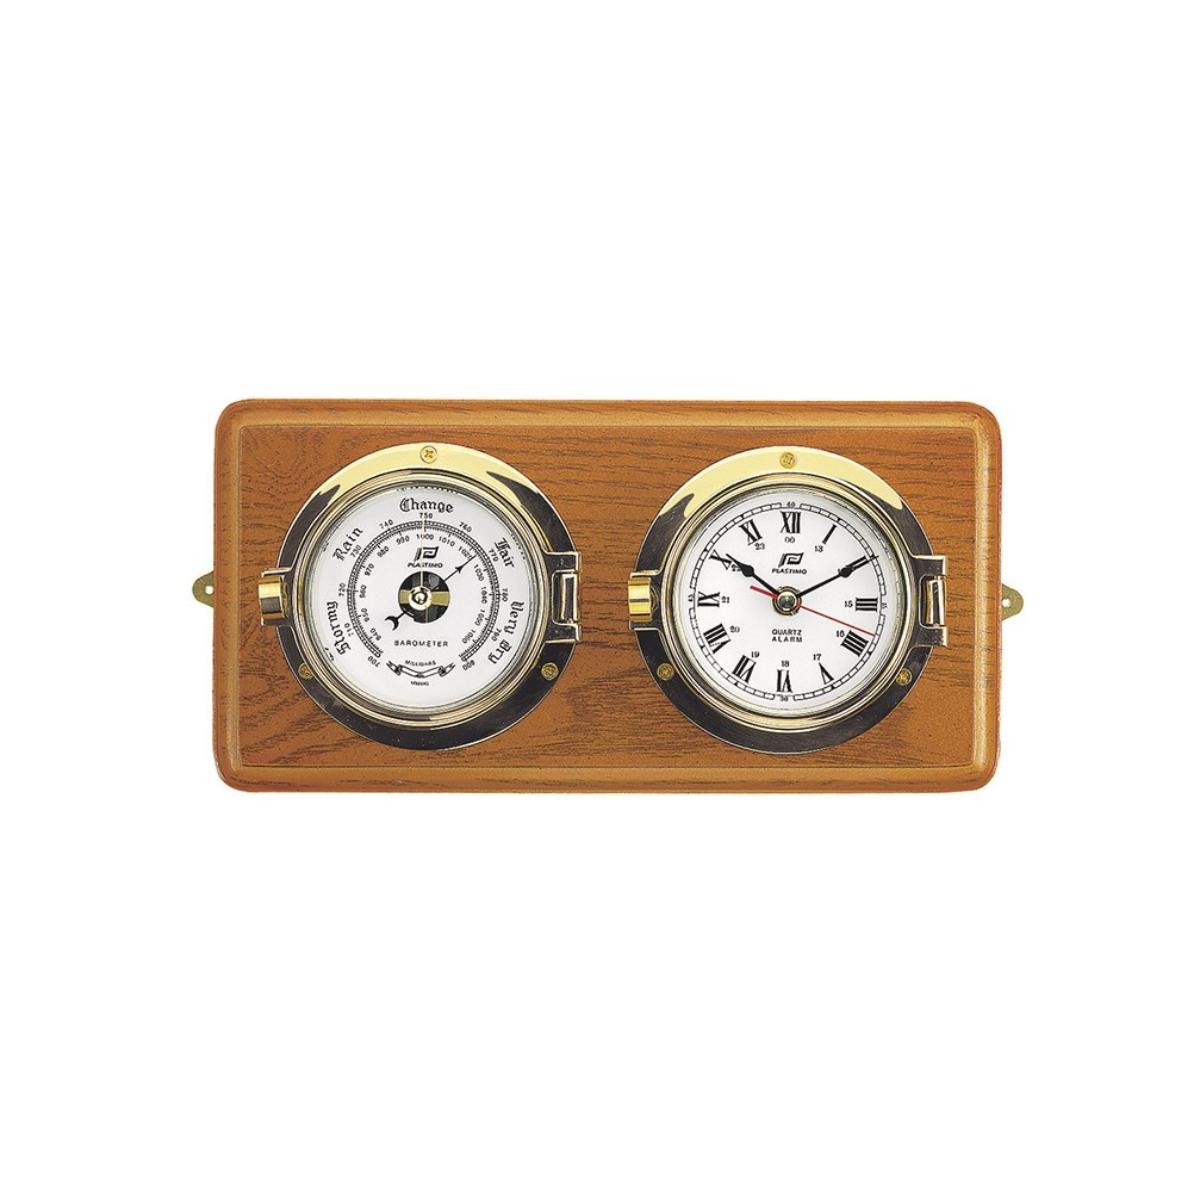 3'' CLOCK & BAROMETER SET ON HARD WOOD BOARD